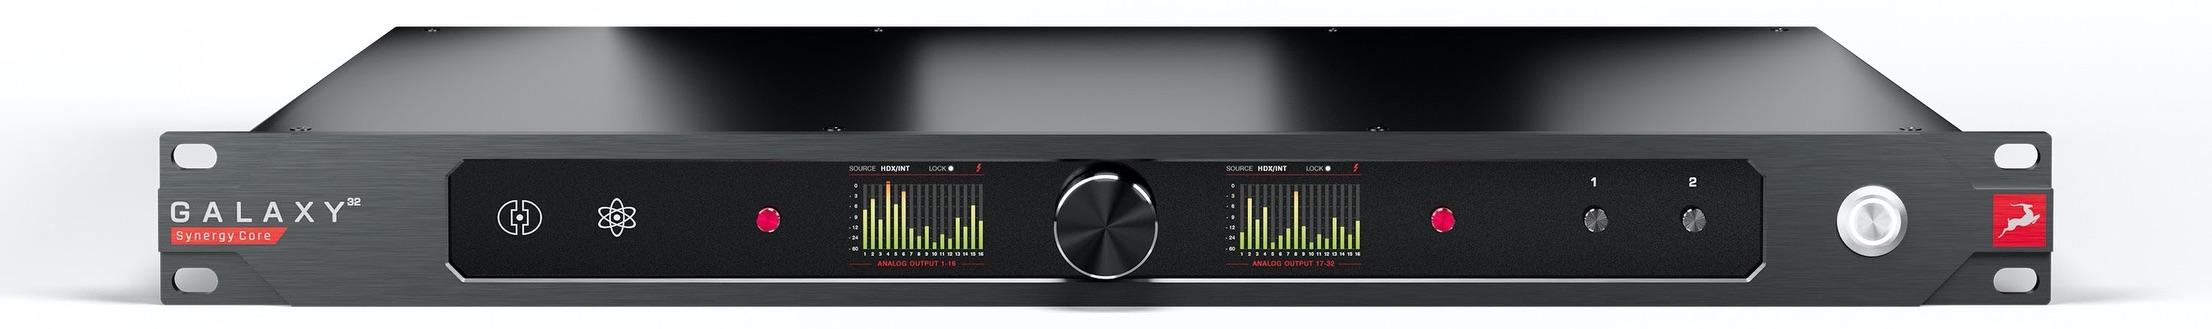 Antelope Audio Galaxy 32 Synergy Core bald im Handel